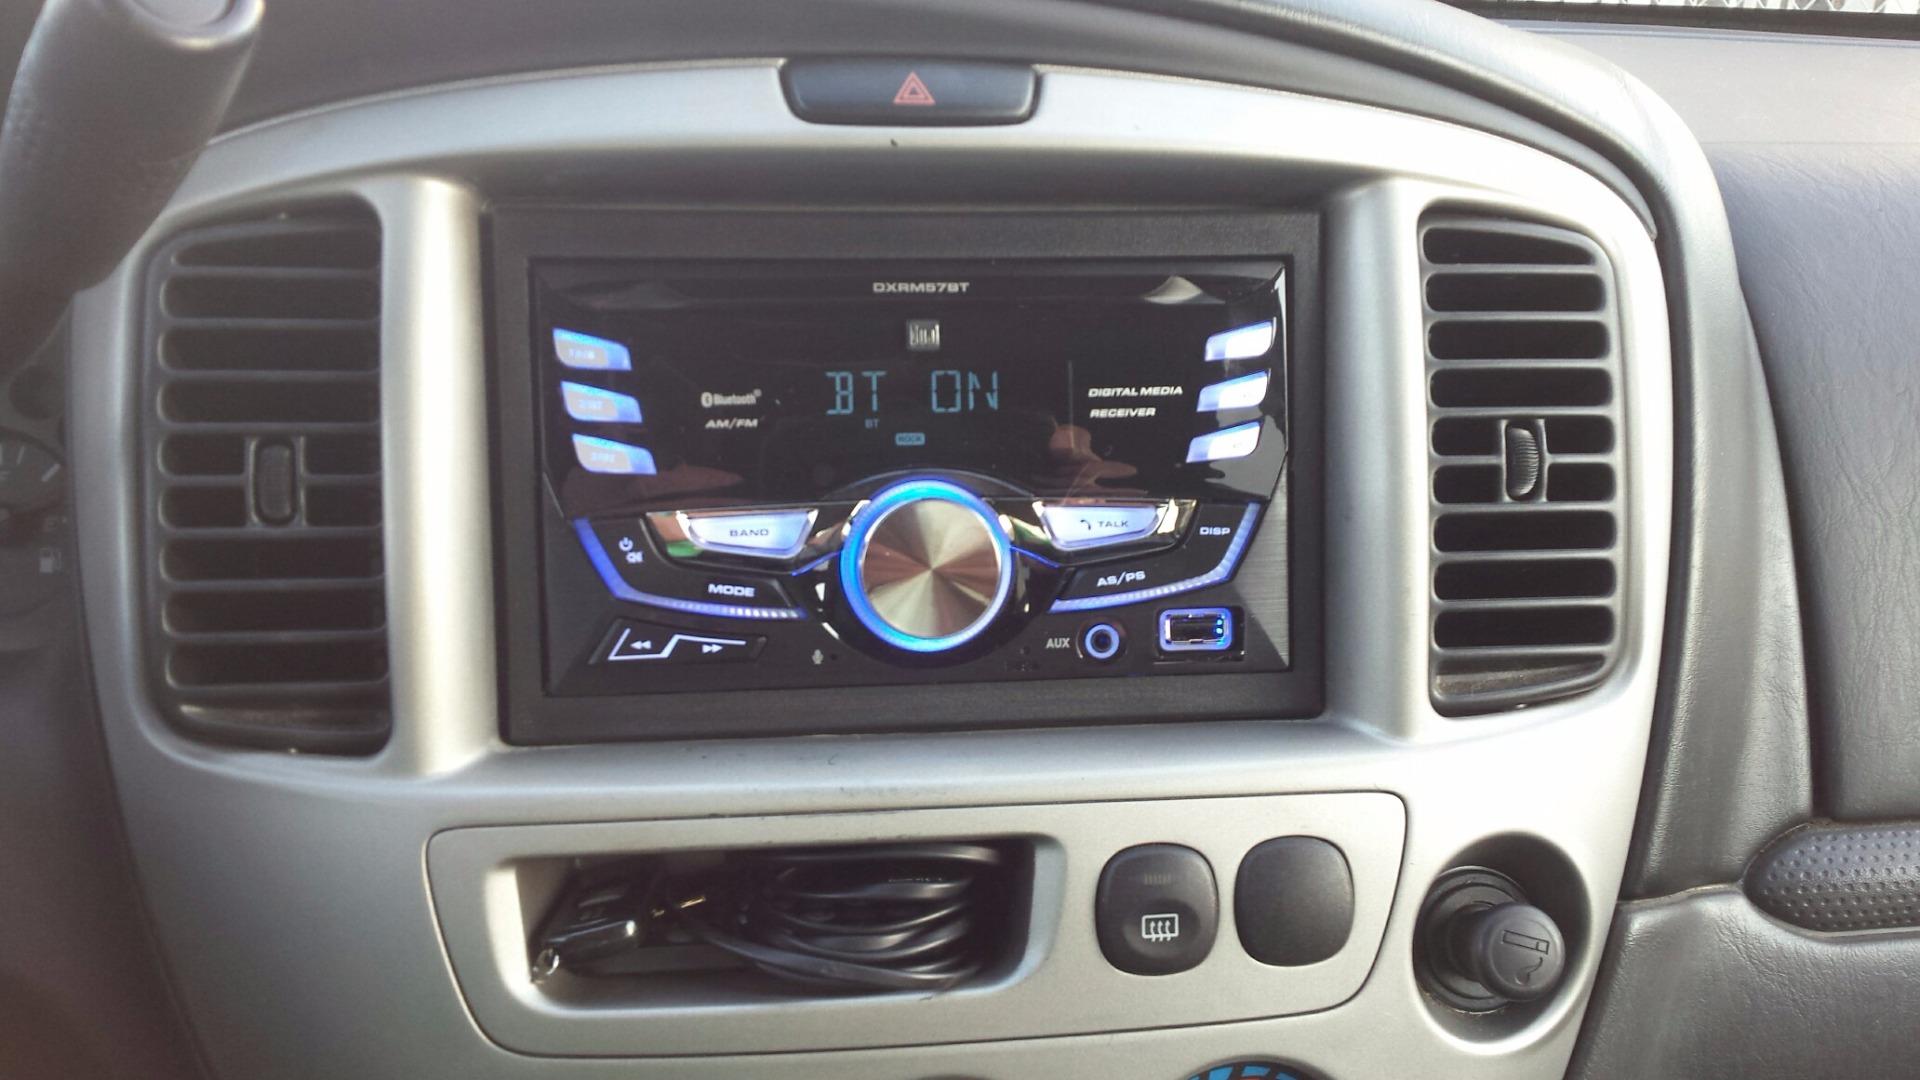 Dual DXRM57BT Digital media receiver (does not play CDs) at Crutchfield